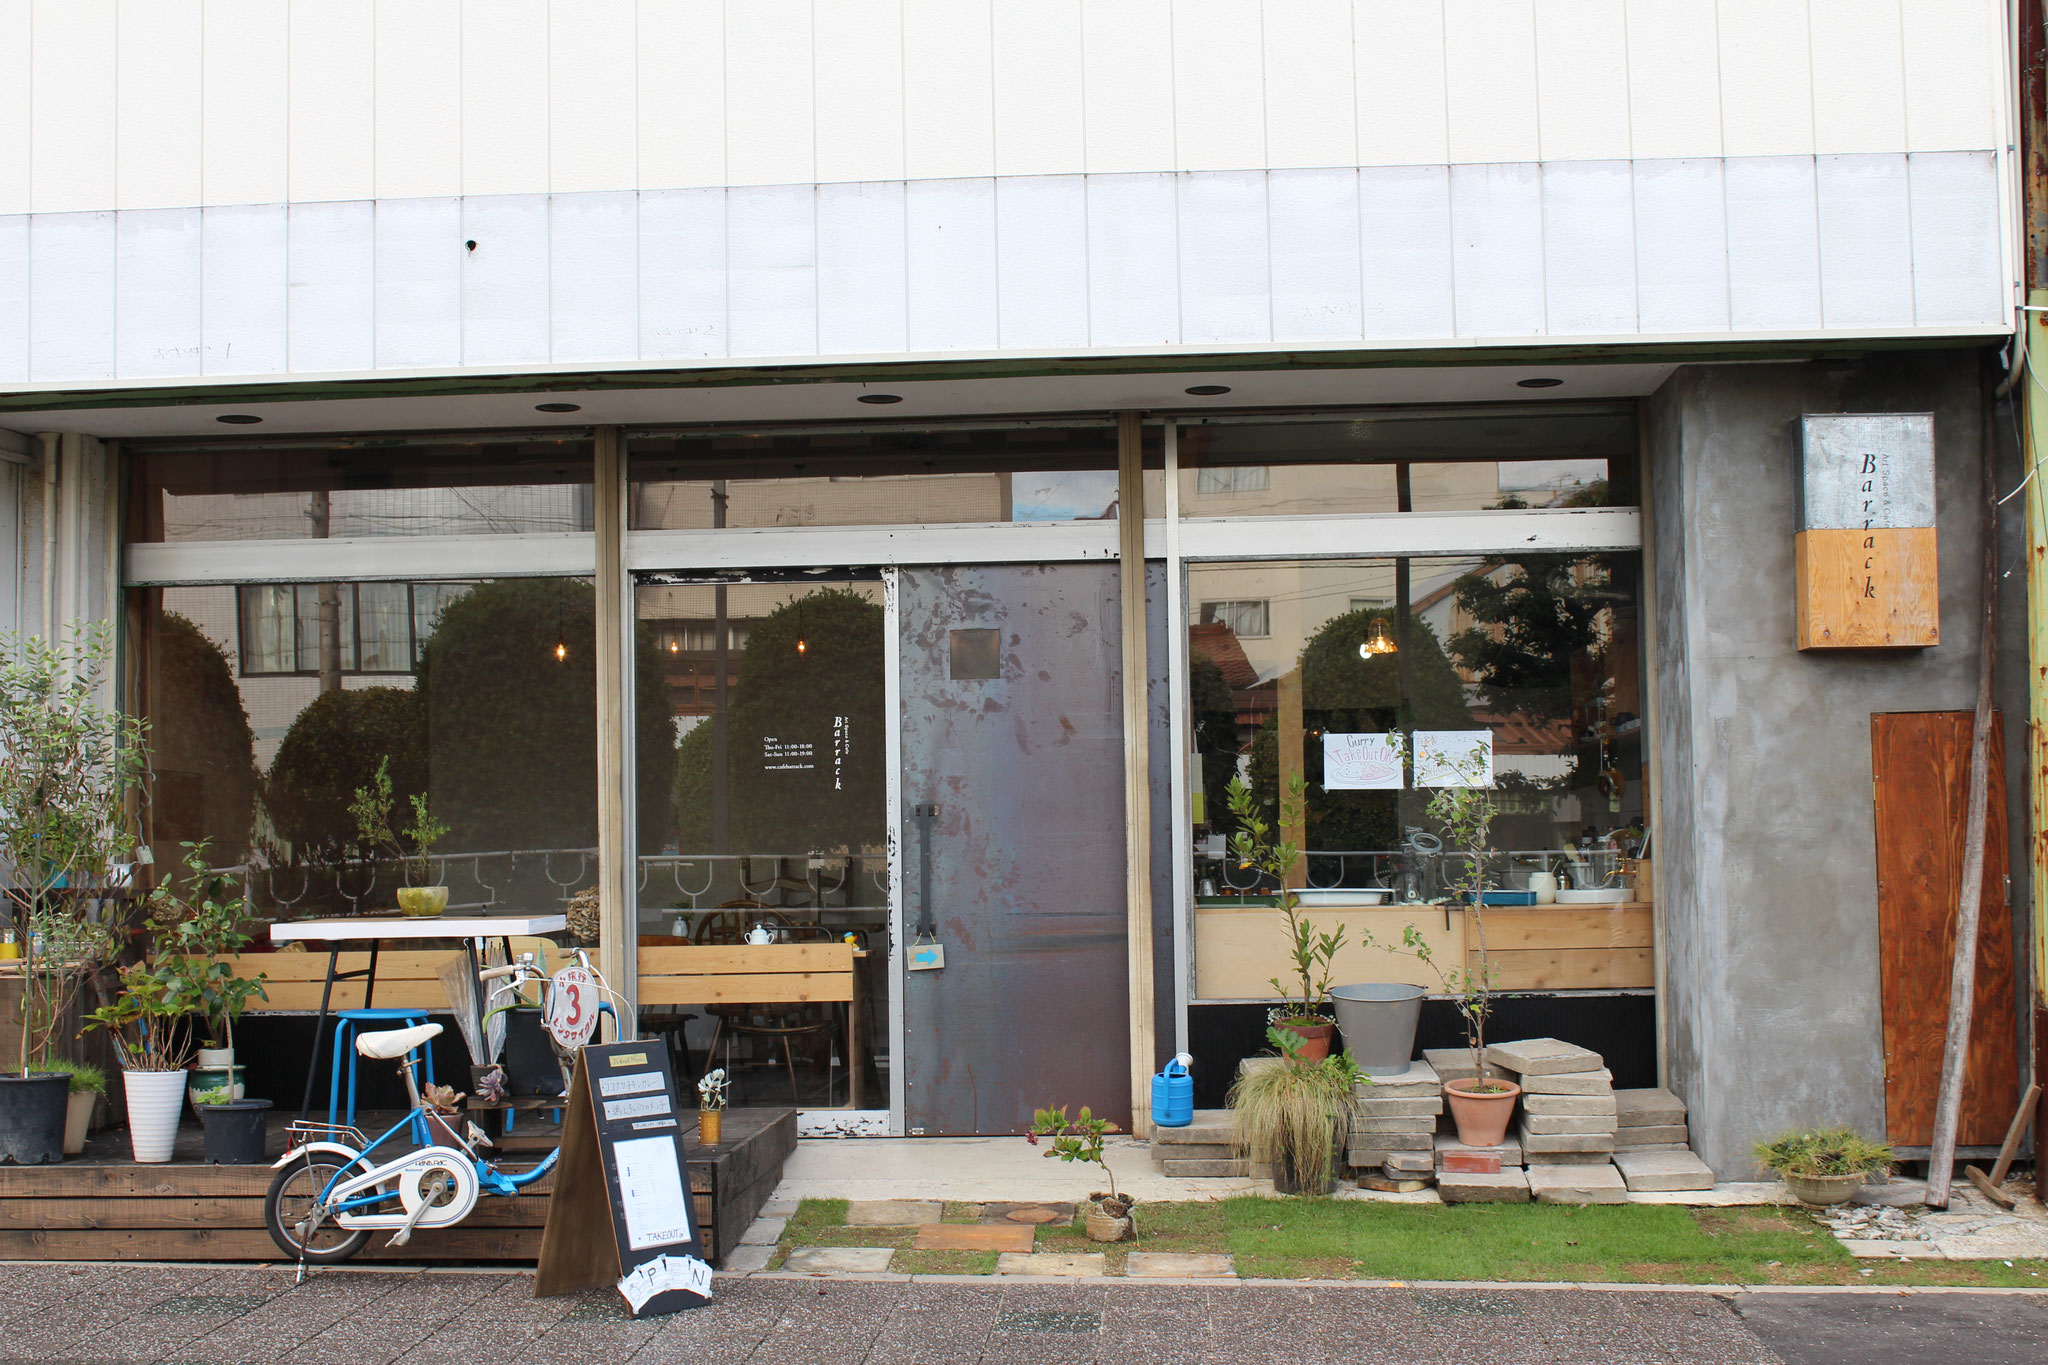 Art Space & Cafe Barrack